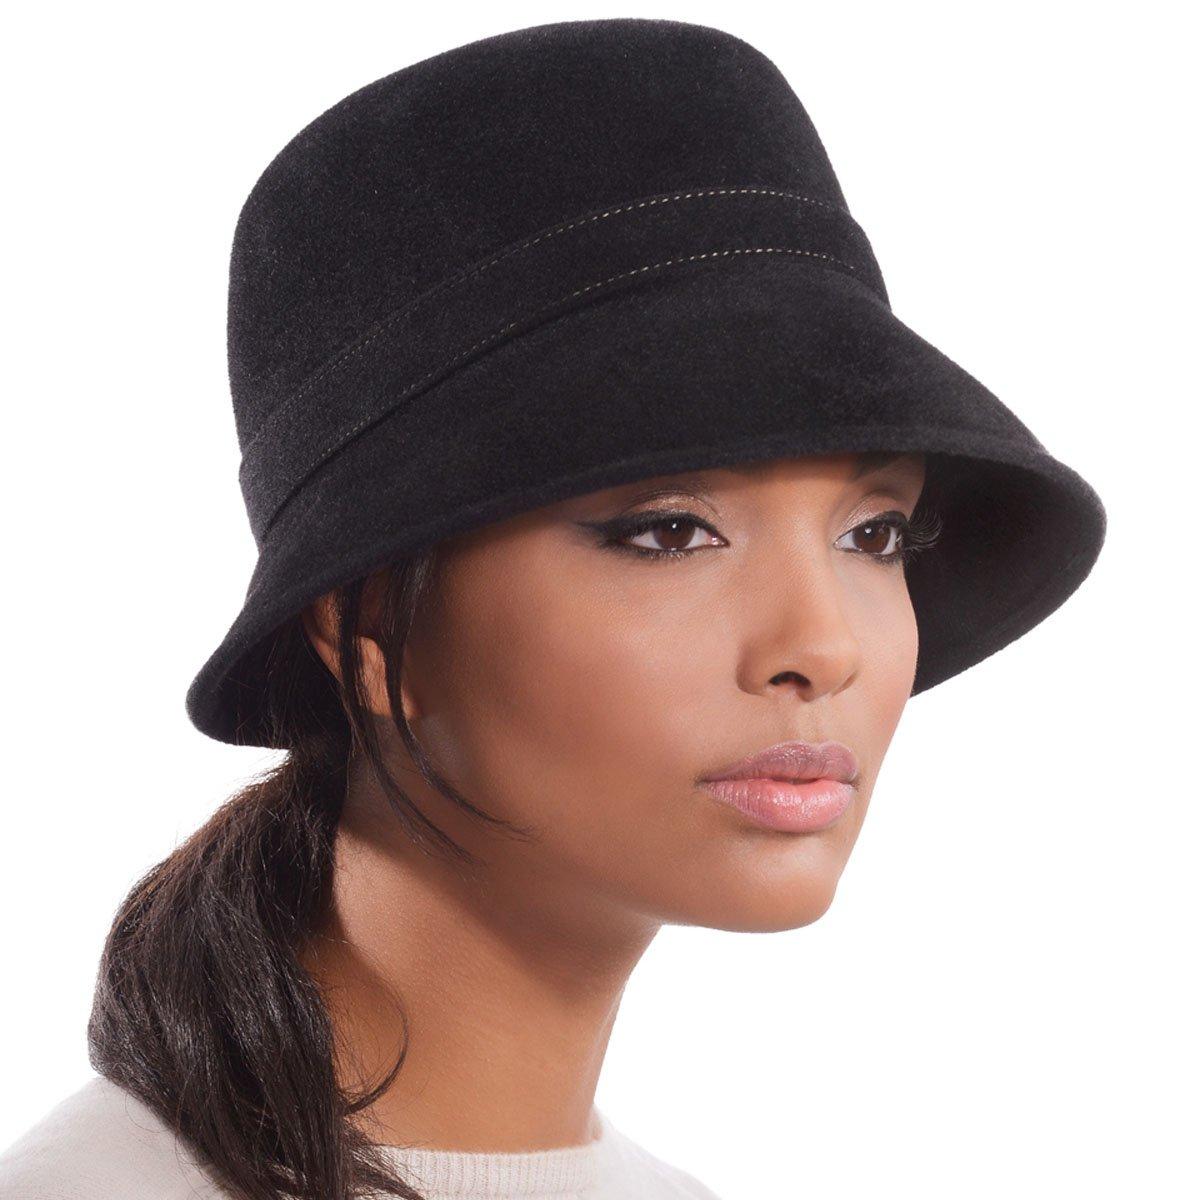 Eric Javits Luxury Designer Women's Fashion Headwear Hat - Hillary - Black